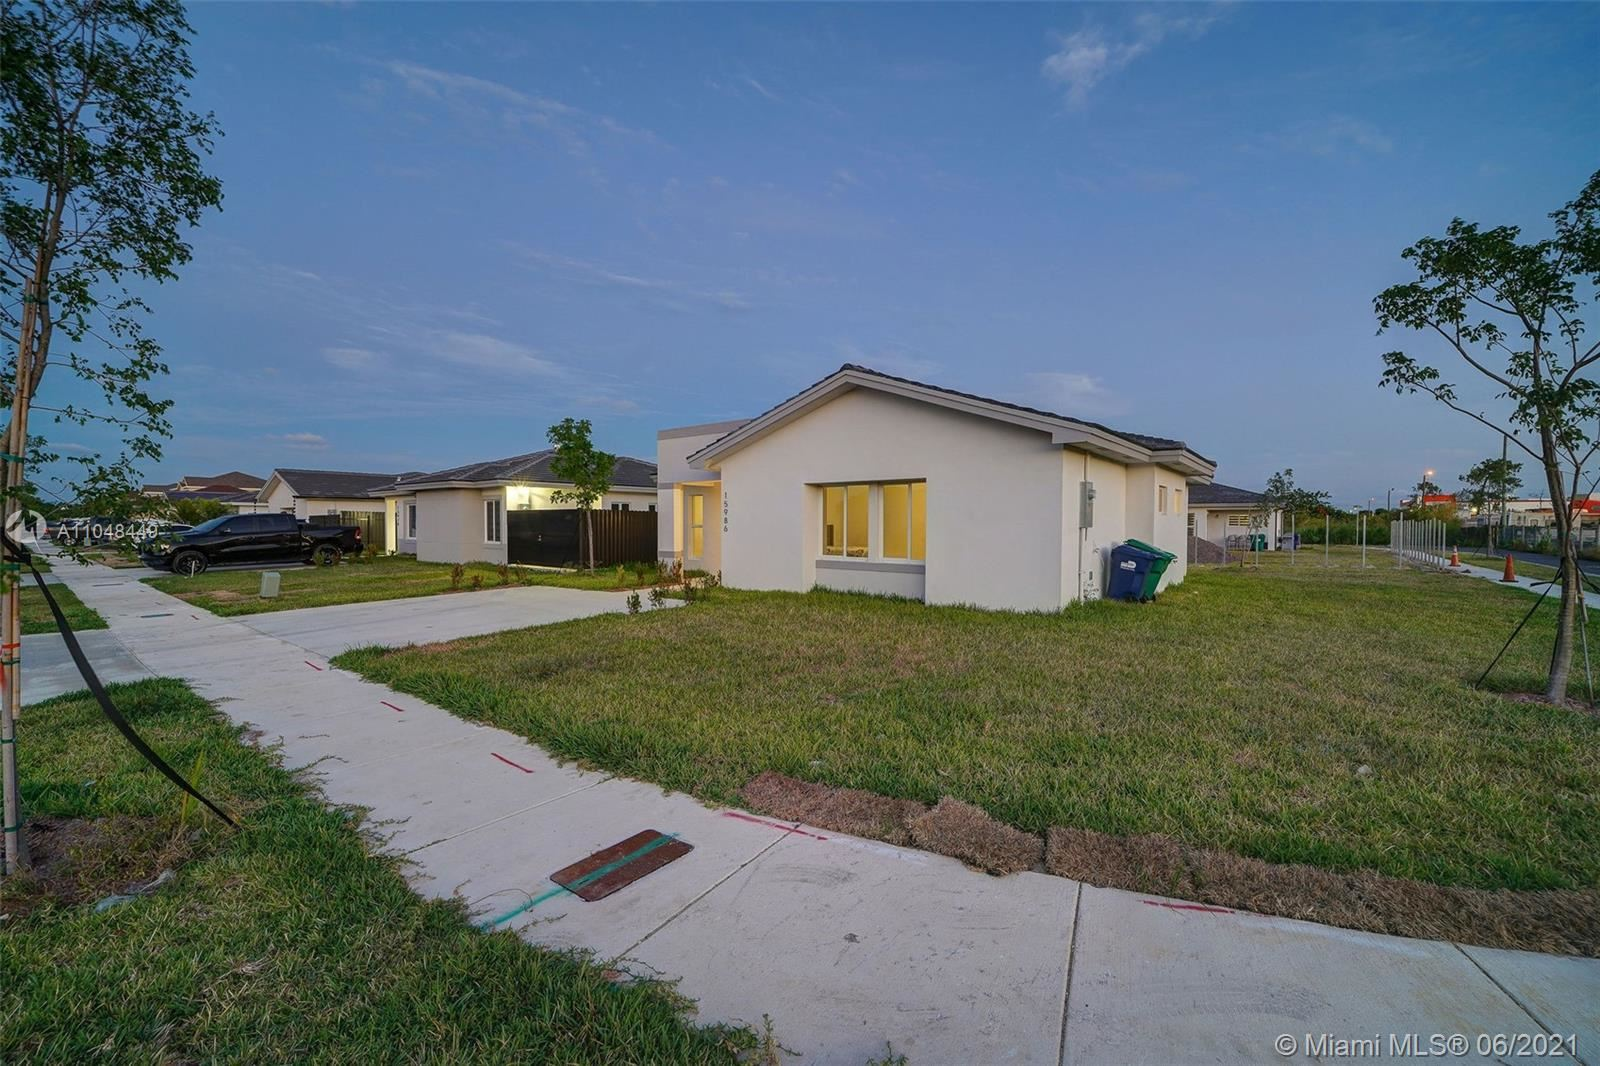 15986 SW 307th Ter, Homestead, FL 33033 - #: A11048449